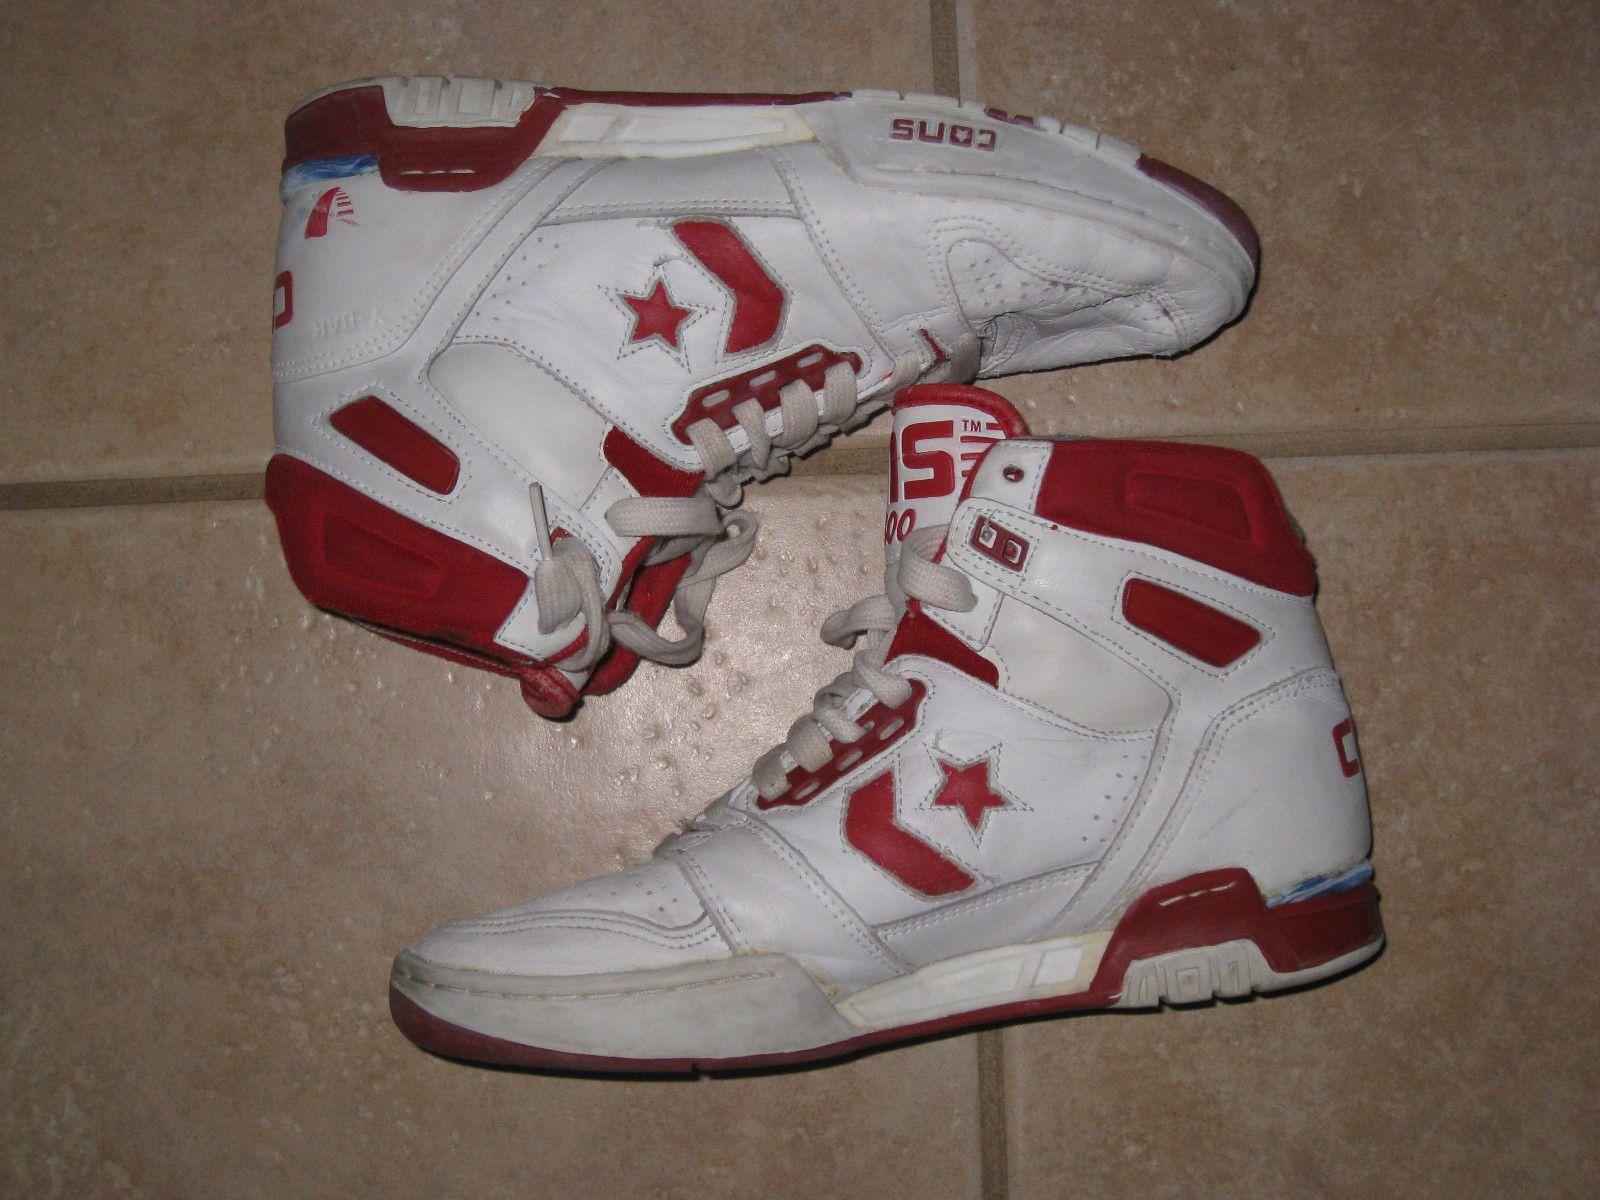 ... Vintage Converse ERX 300 Sneakers Size 9 5 eBay ... c211294f3d